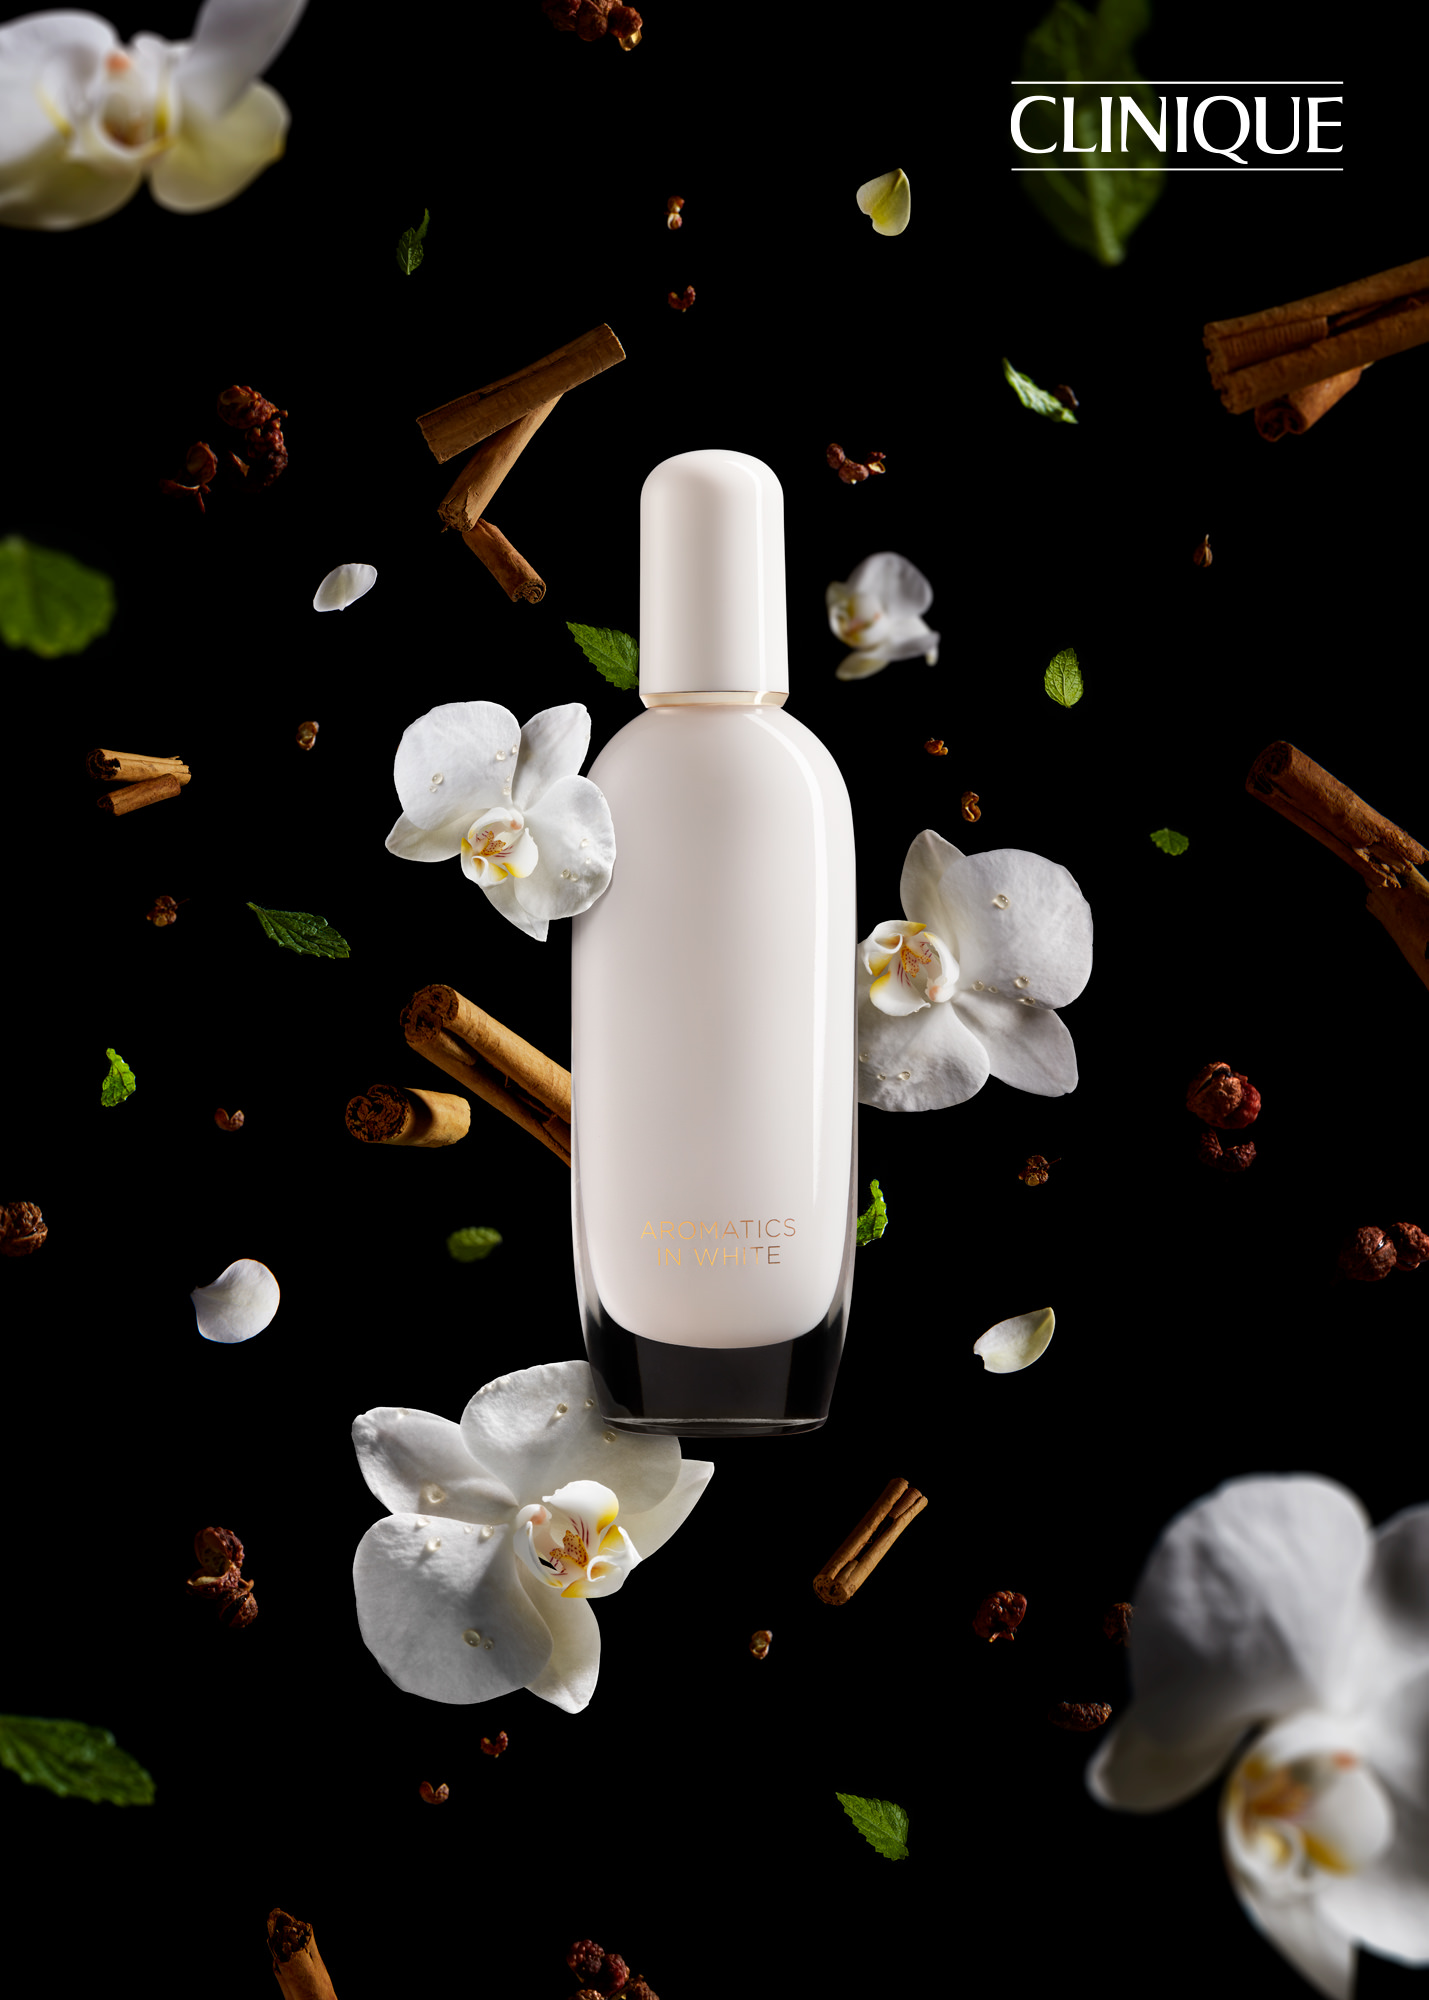 clinique aromatics ingredients fragrance advert